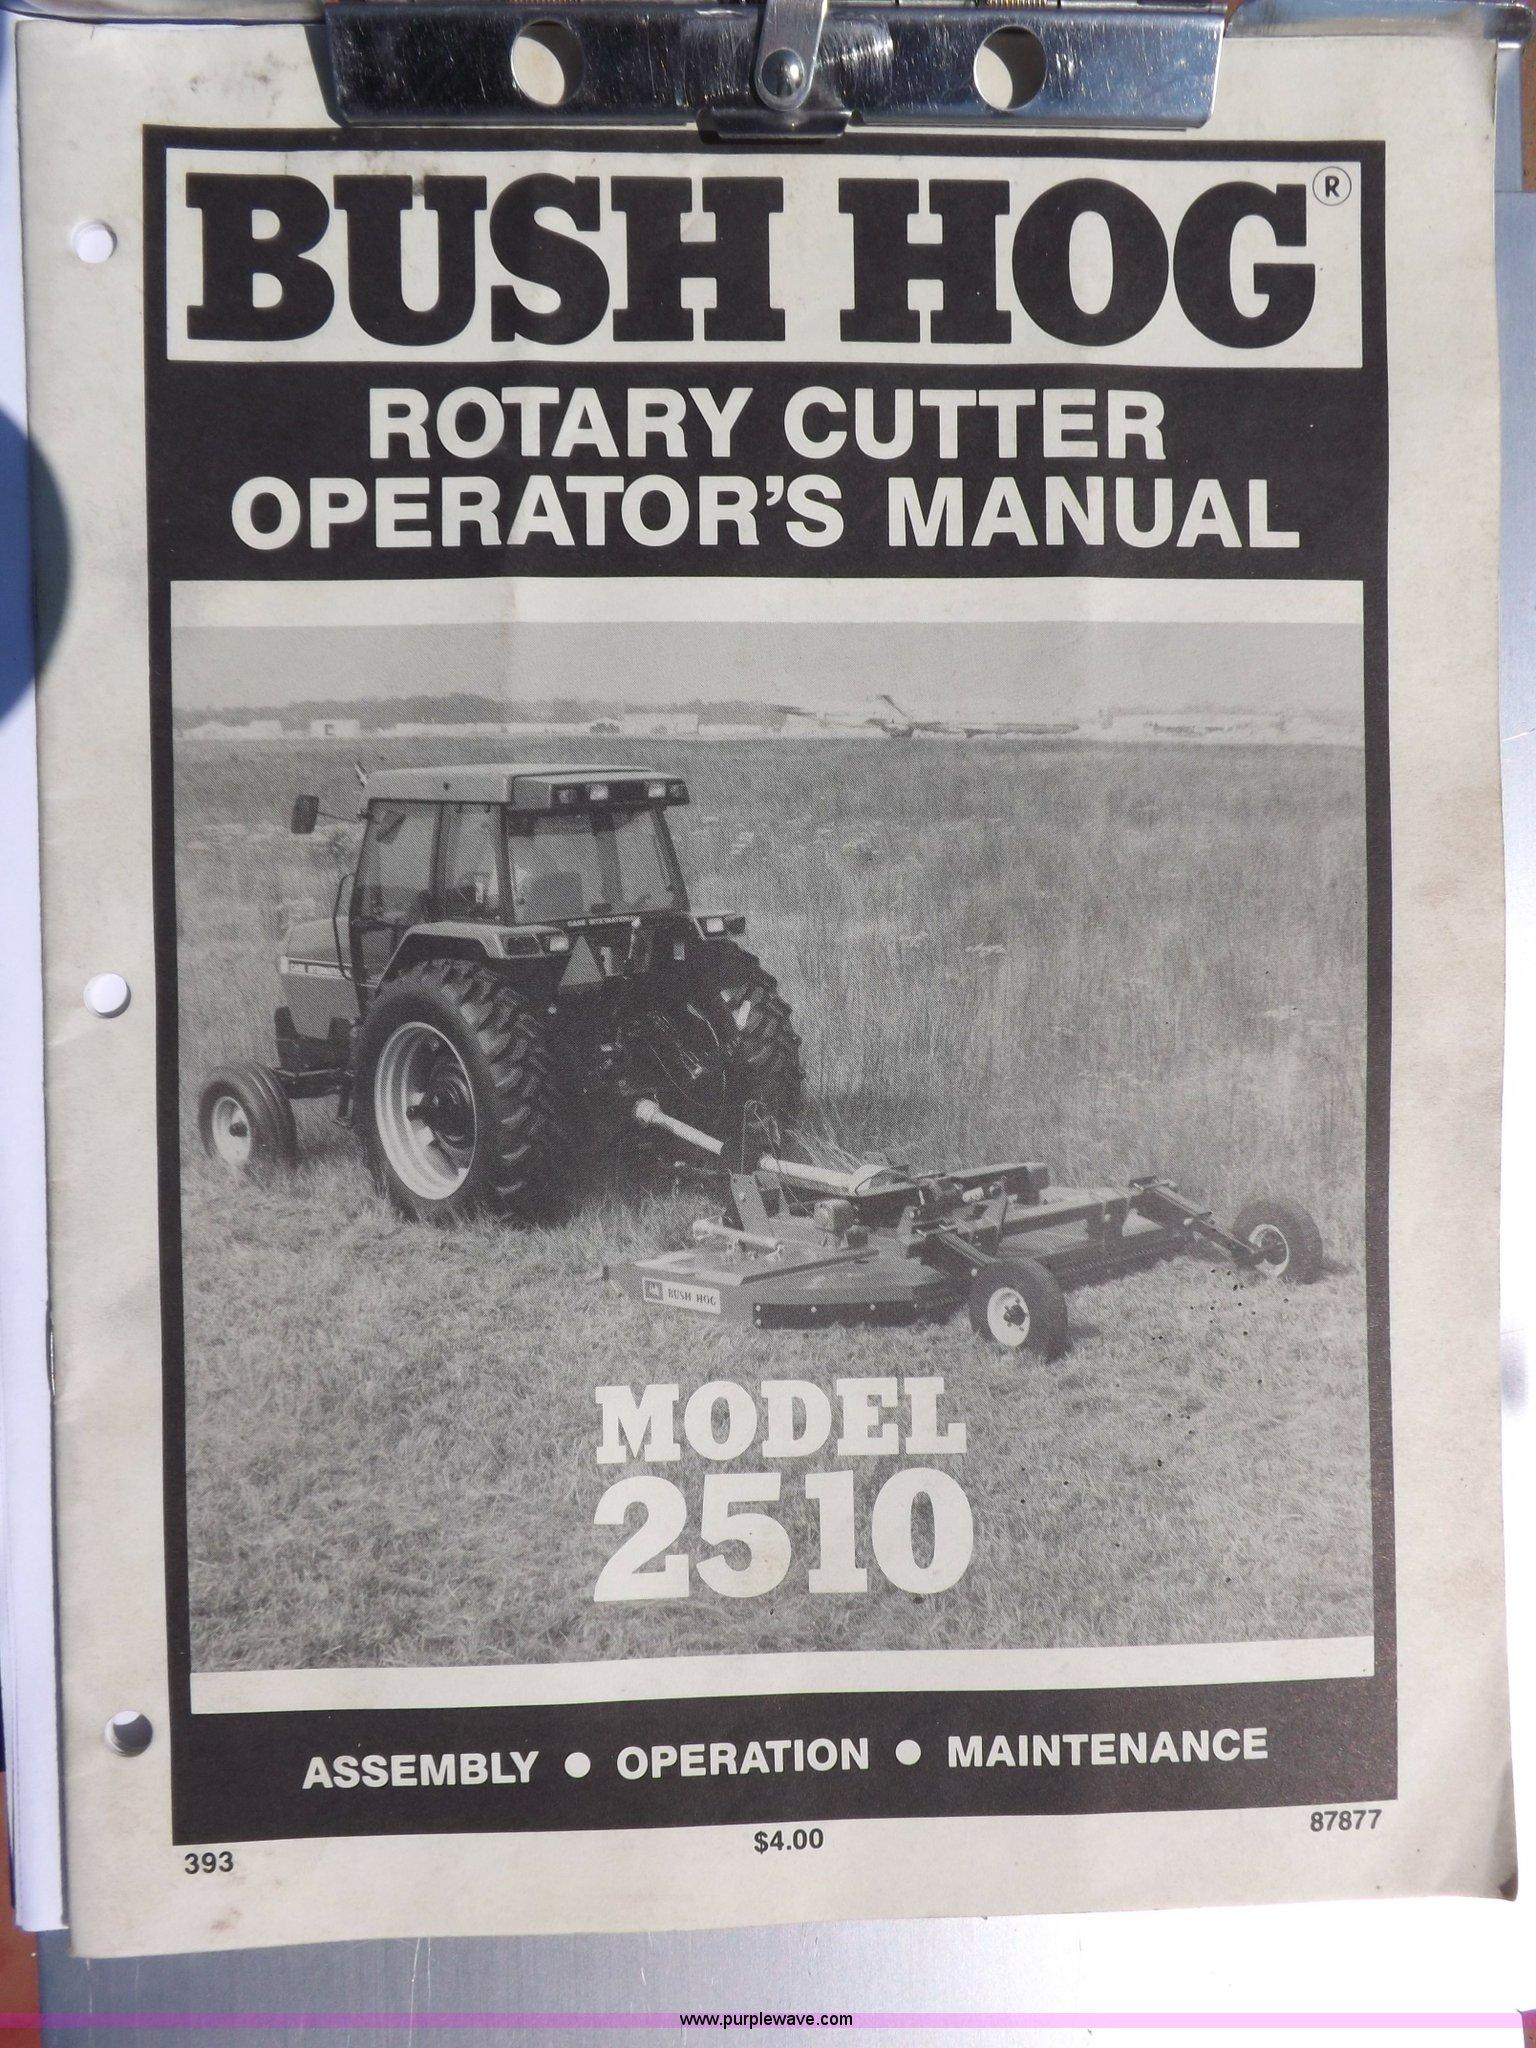 Bush Hog 12510 rotary mower | Item I7647 | SOLD! August 28 A